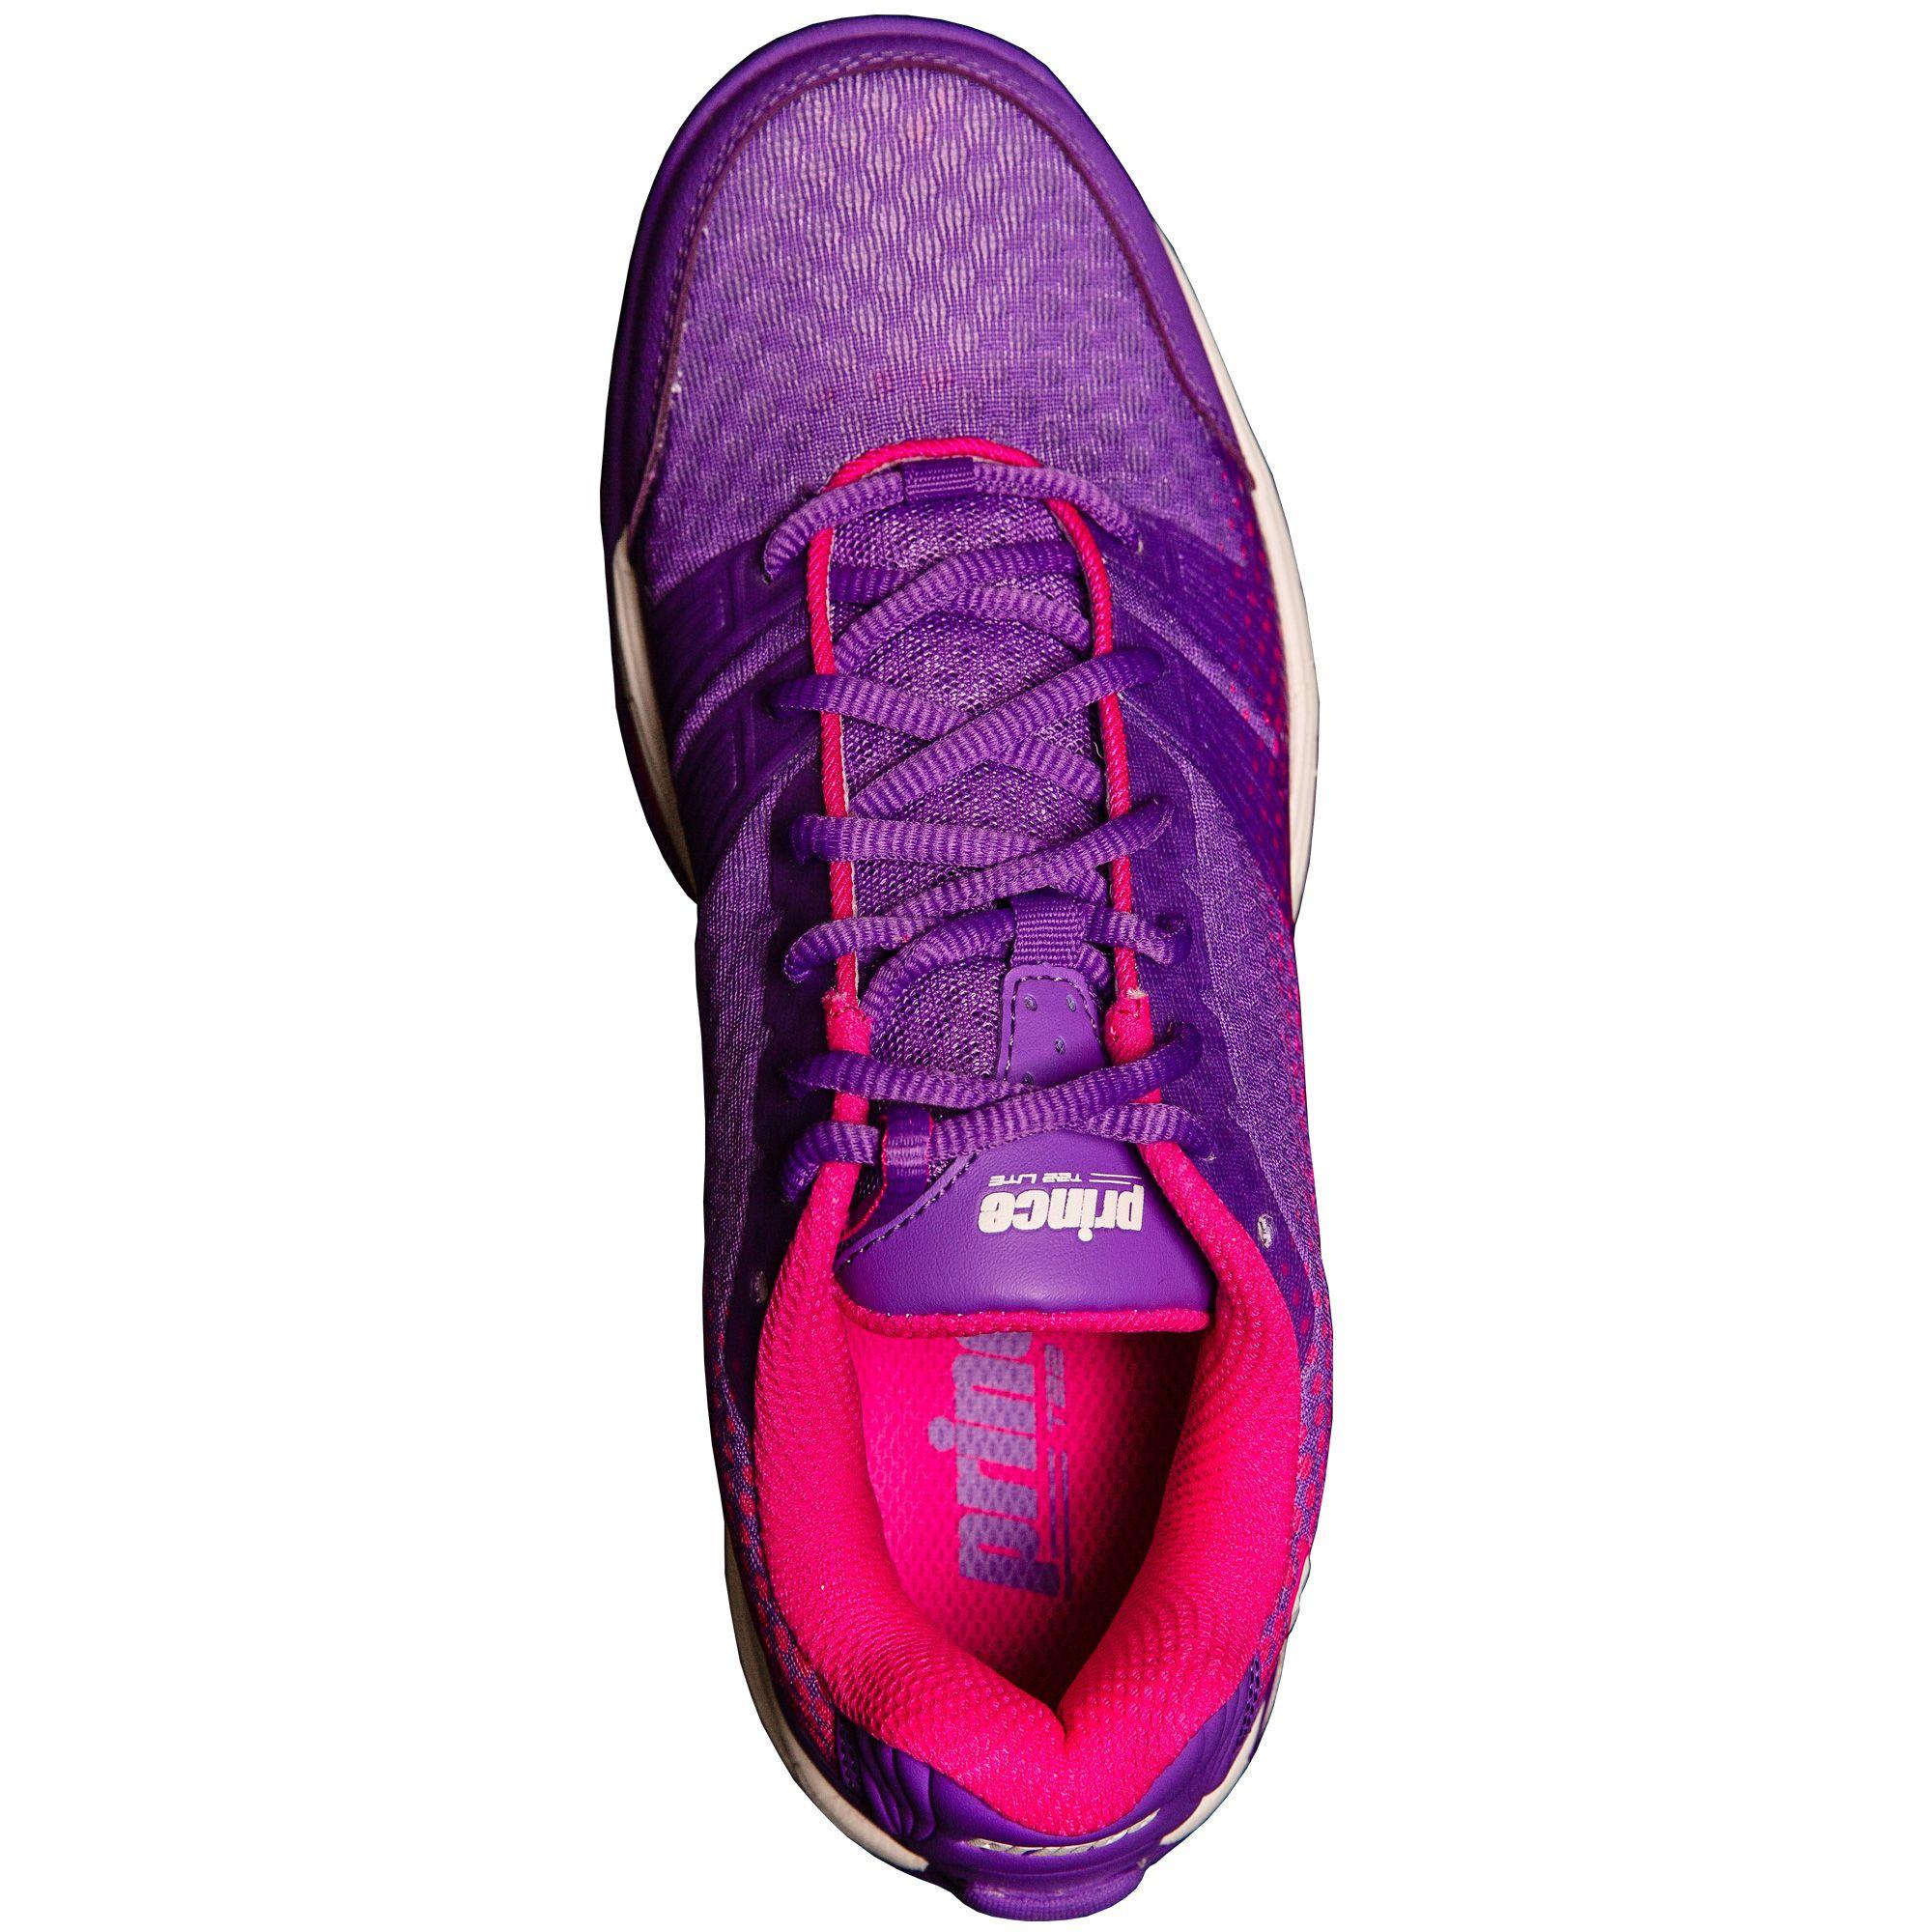 Prince T Tennis Shoes